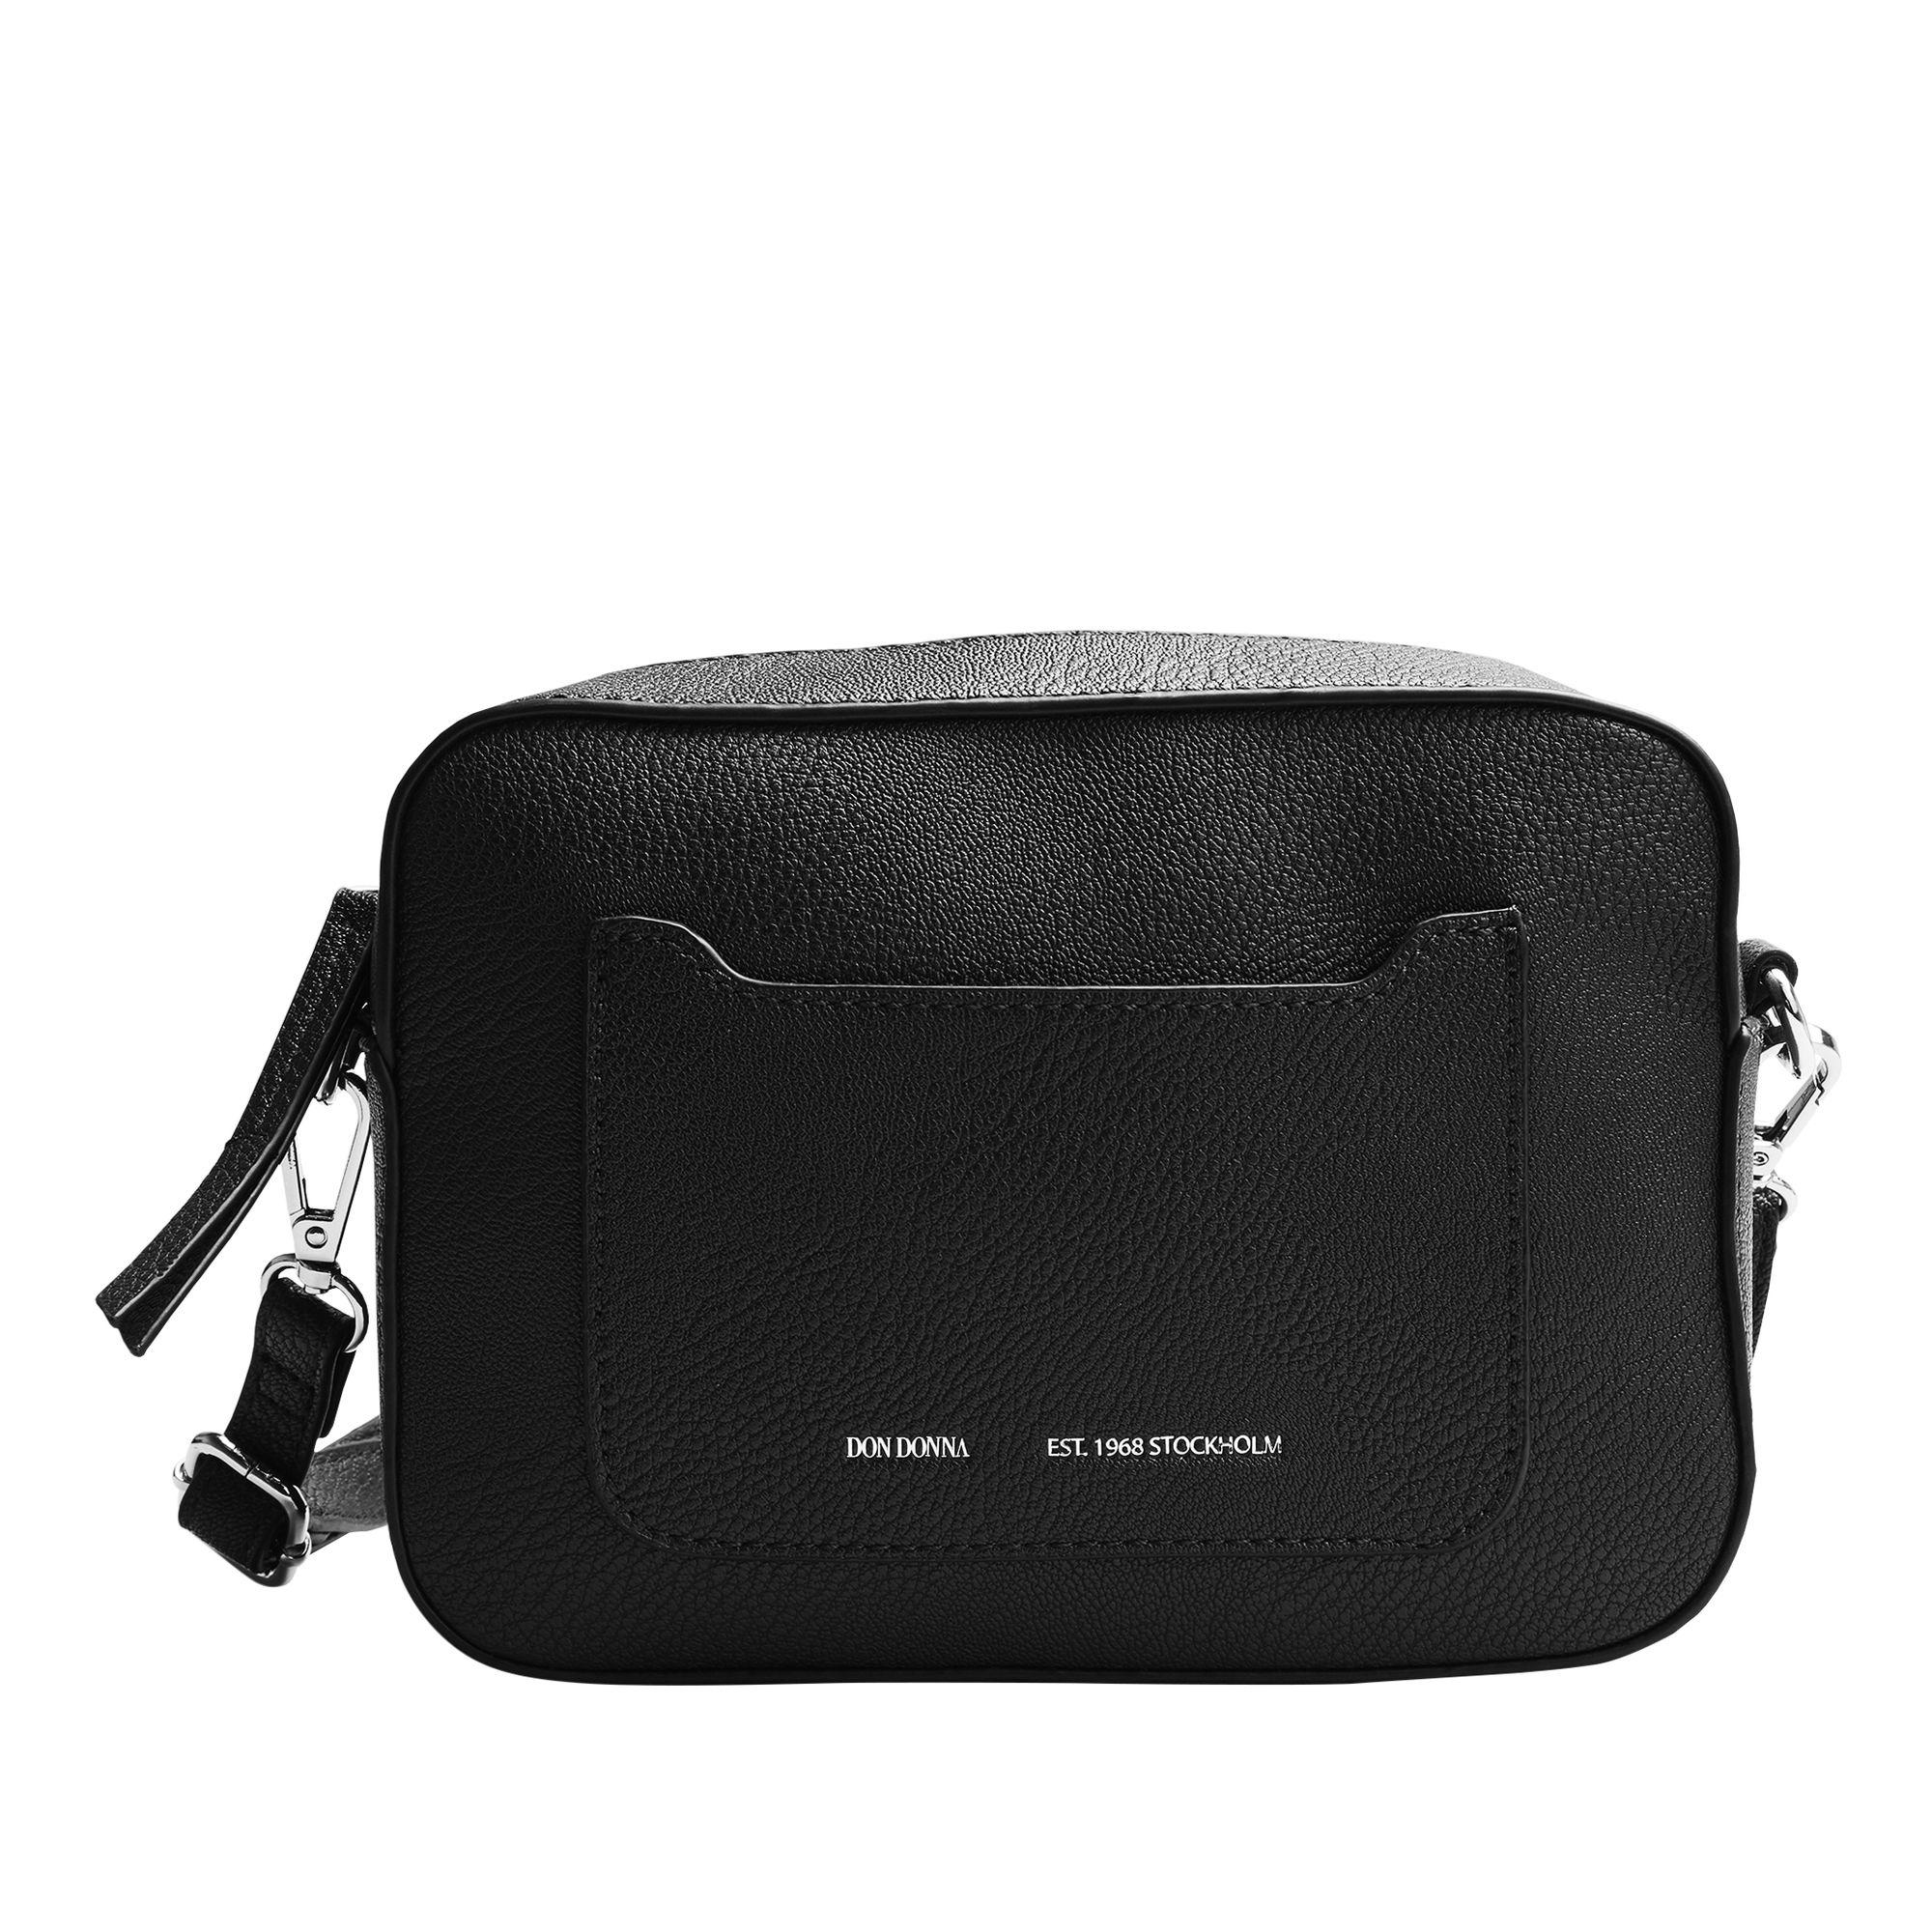 Don Donna Zelda Camera Bag axelremsväska, Svart